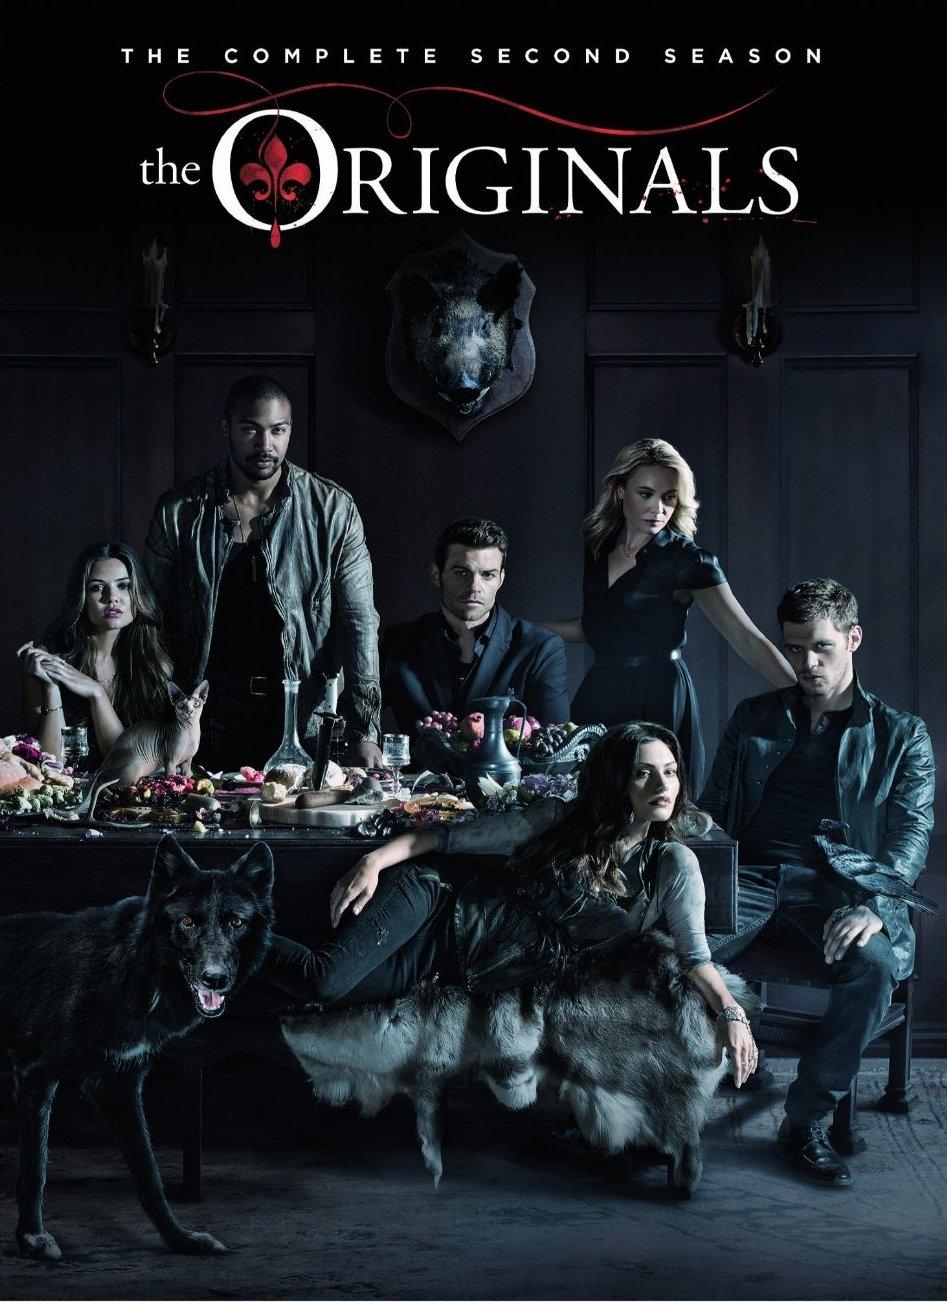 The Originals The Complete Second Season